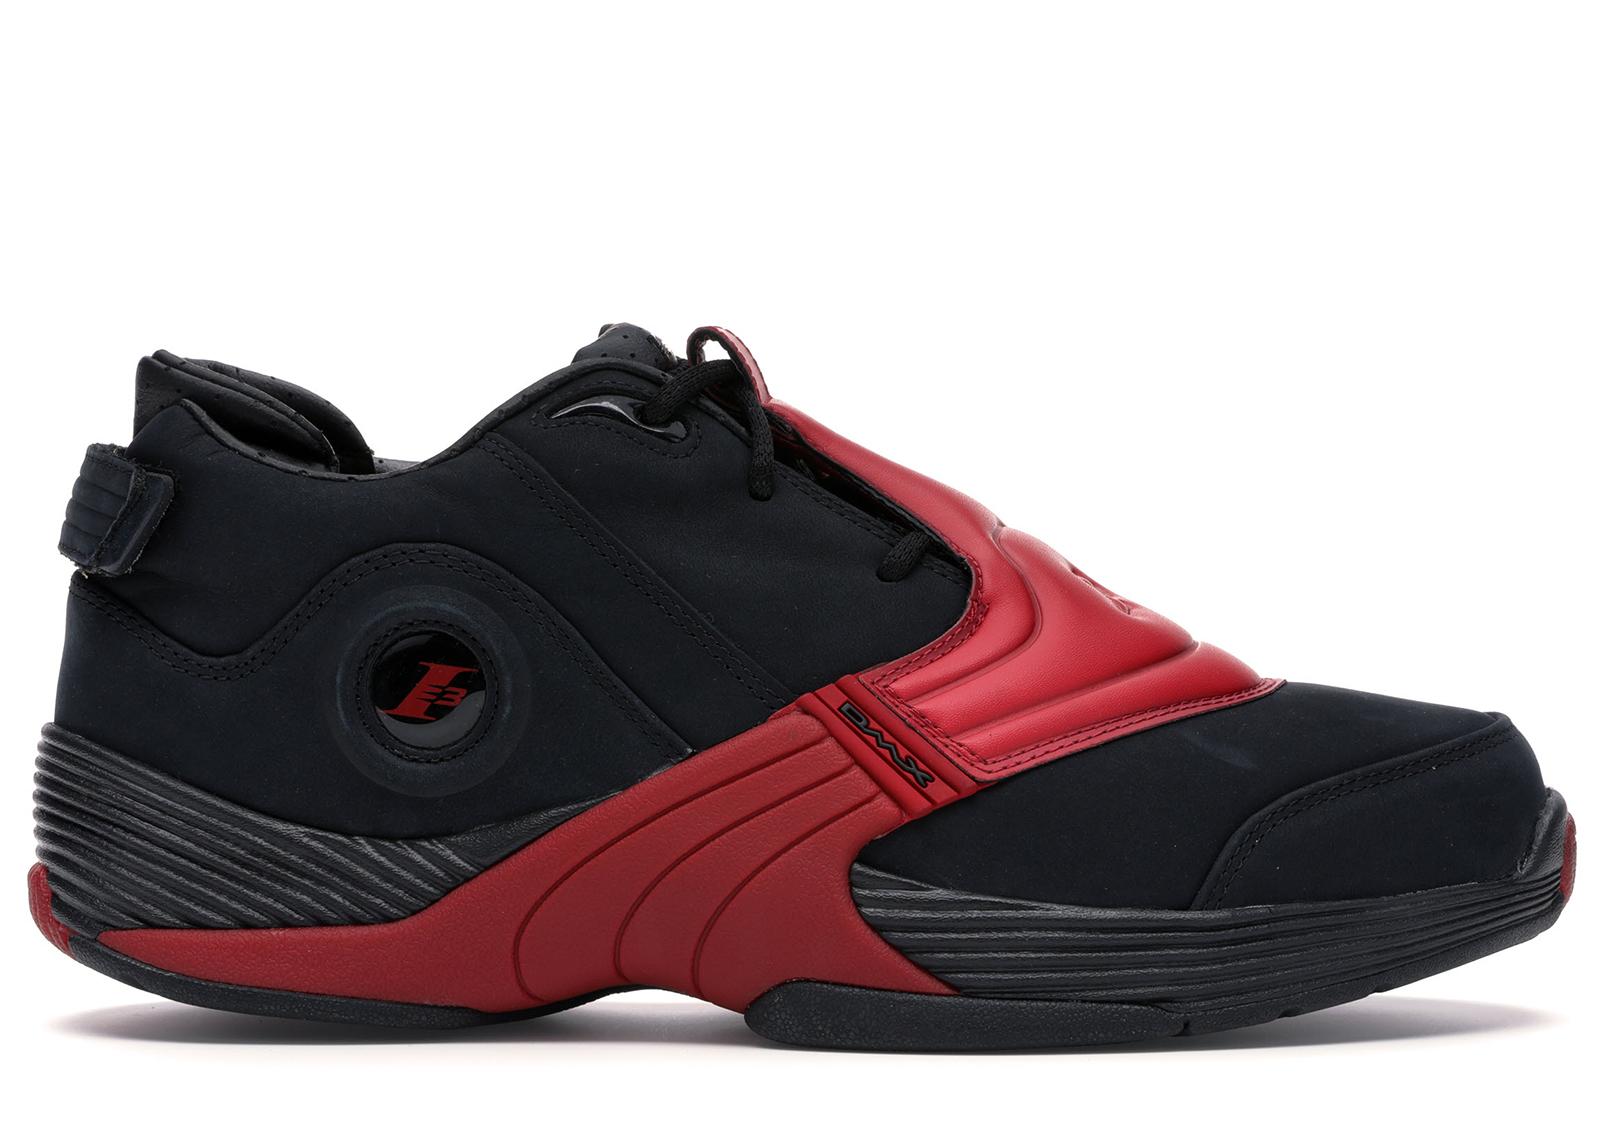 Reebok Answer 5 Black Red - DV8285